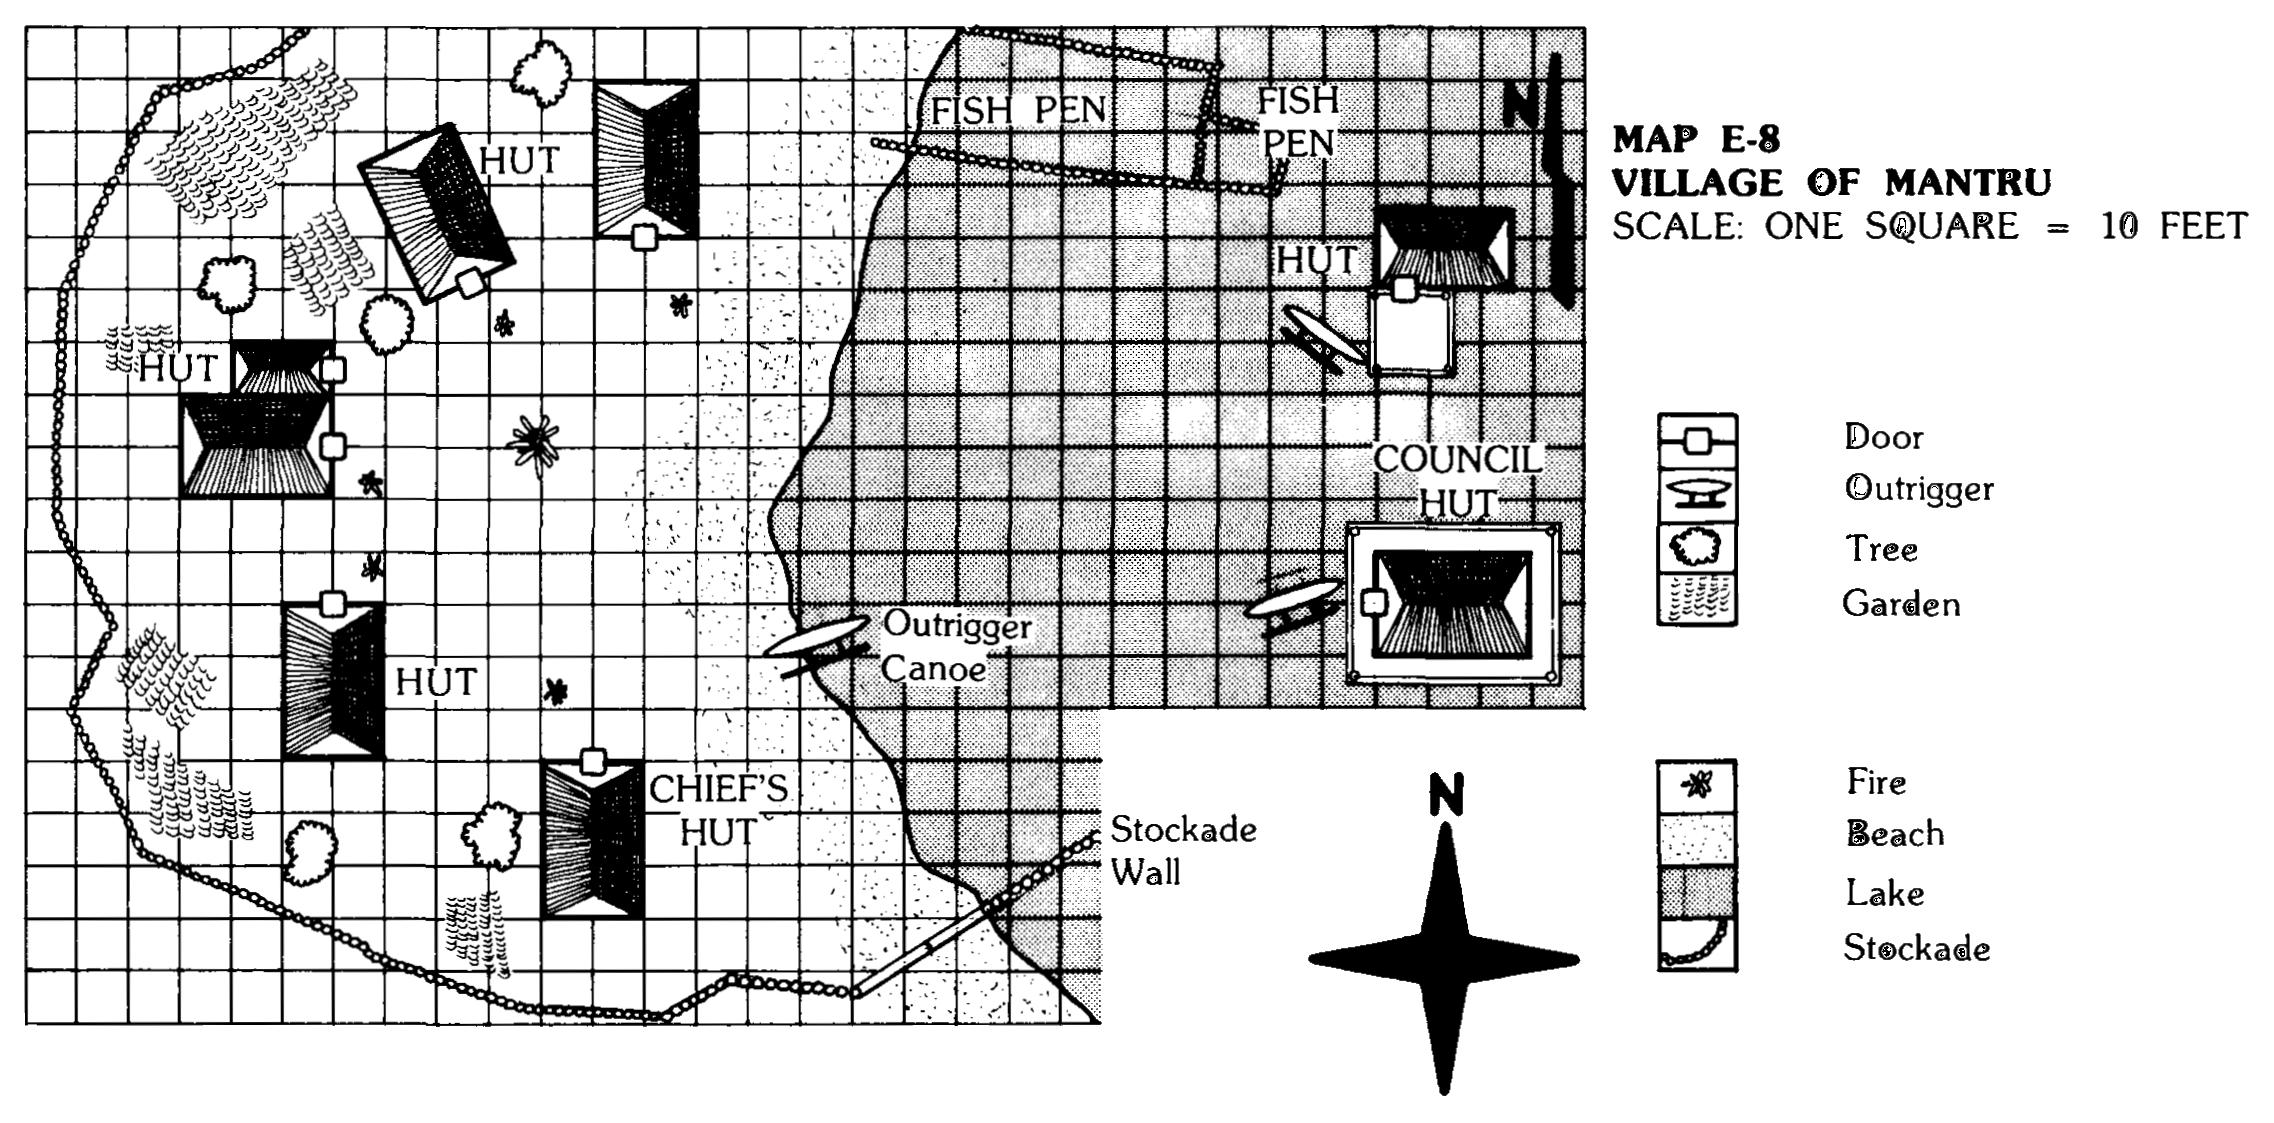 The Gaelean Chronicles: Heroes 4 Hire | Adventure Log | Obsidian Portal